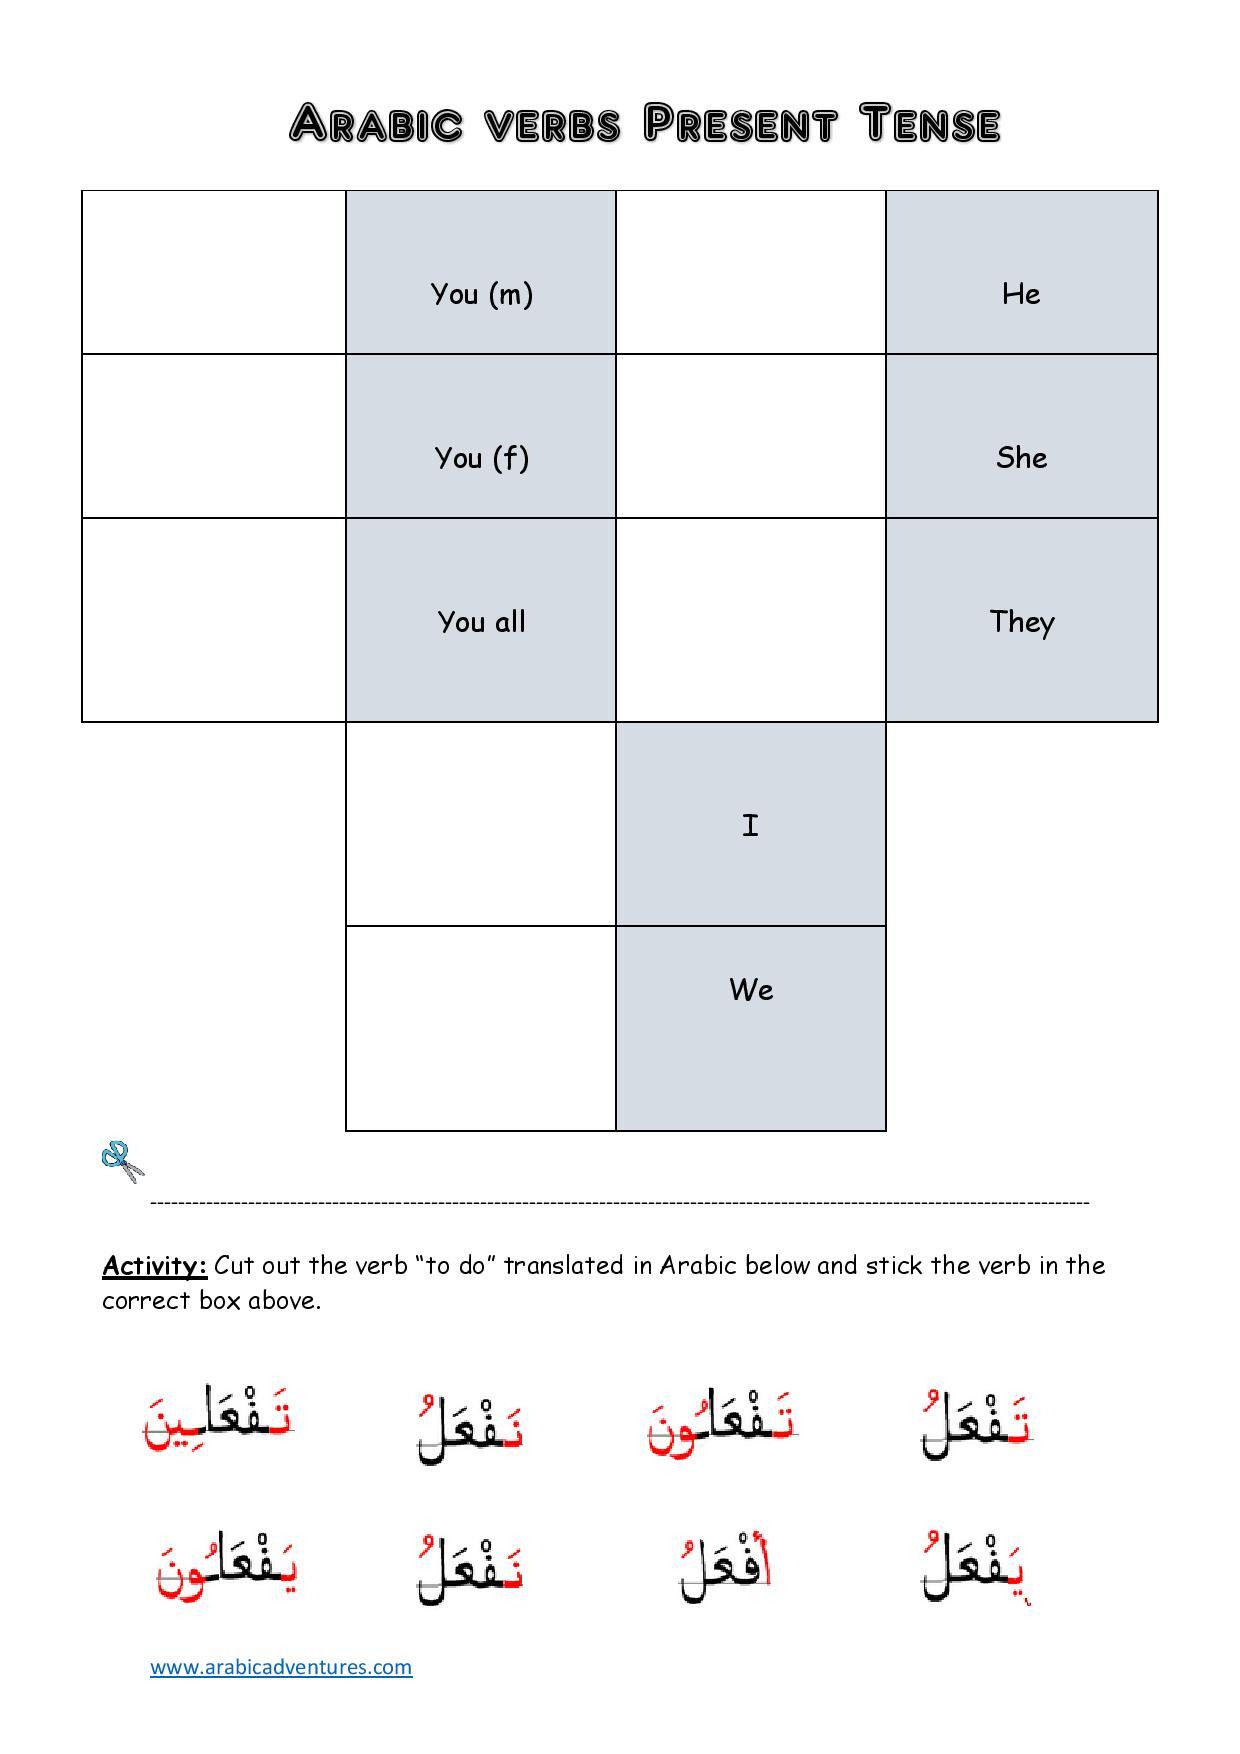 Fi'il mudari' | Arabic Adventures